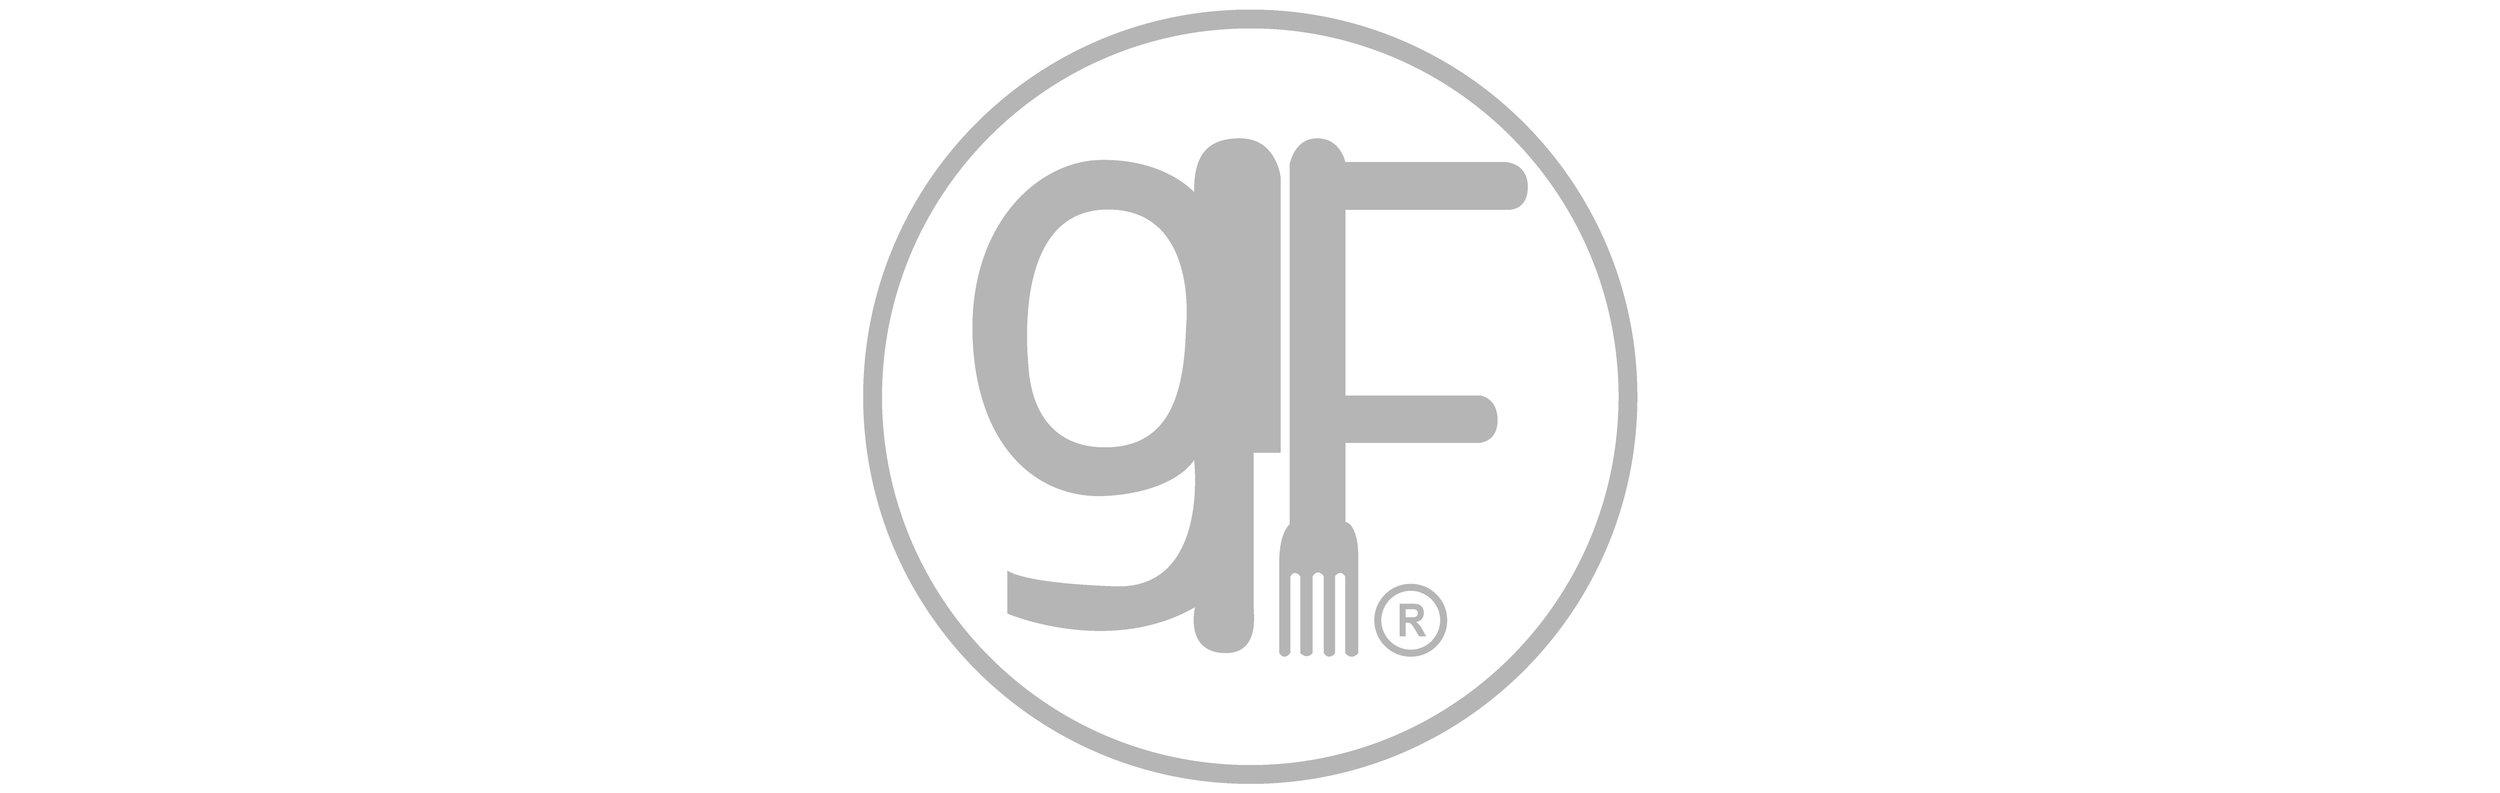 FIlmore-&-Union-Website3.jpg